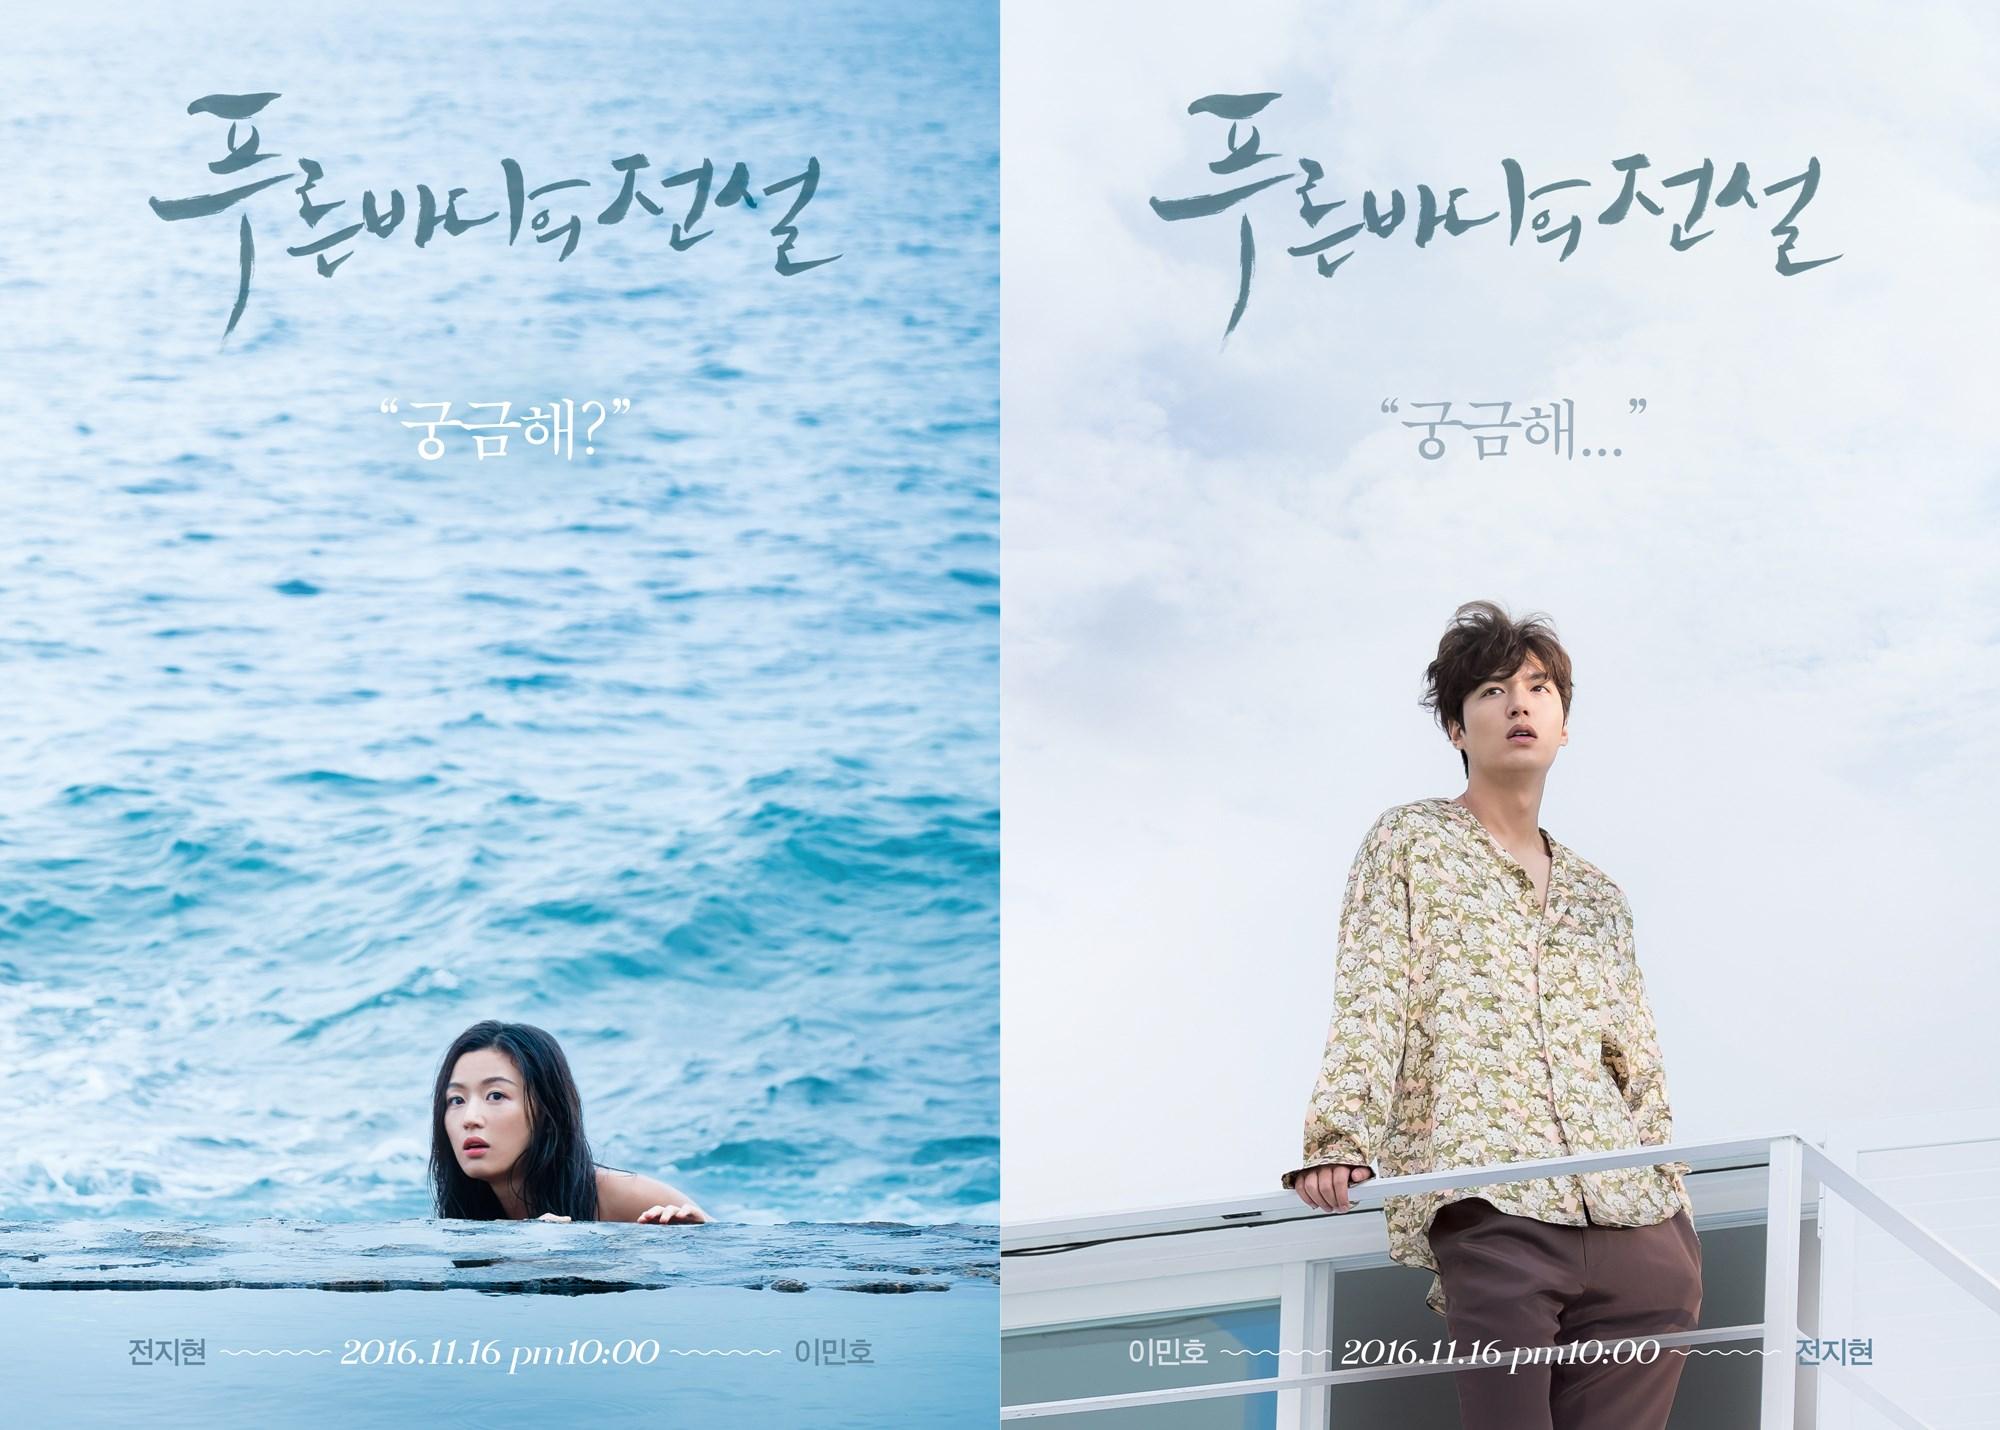 The Legend of the Blue Sea ซีรี่ย์เกาหลี ซับไทย (เรื่องย่อ)